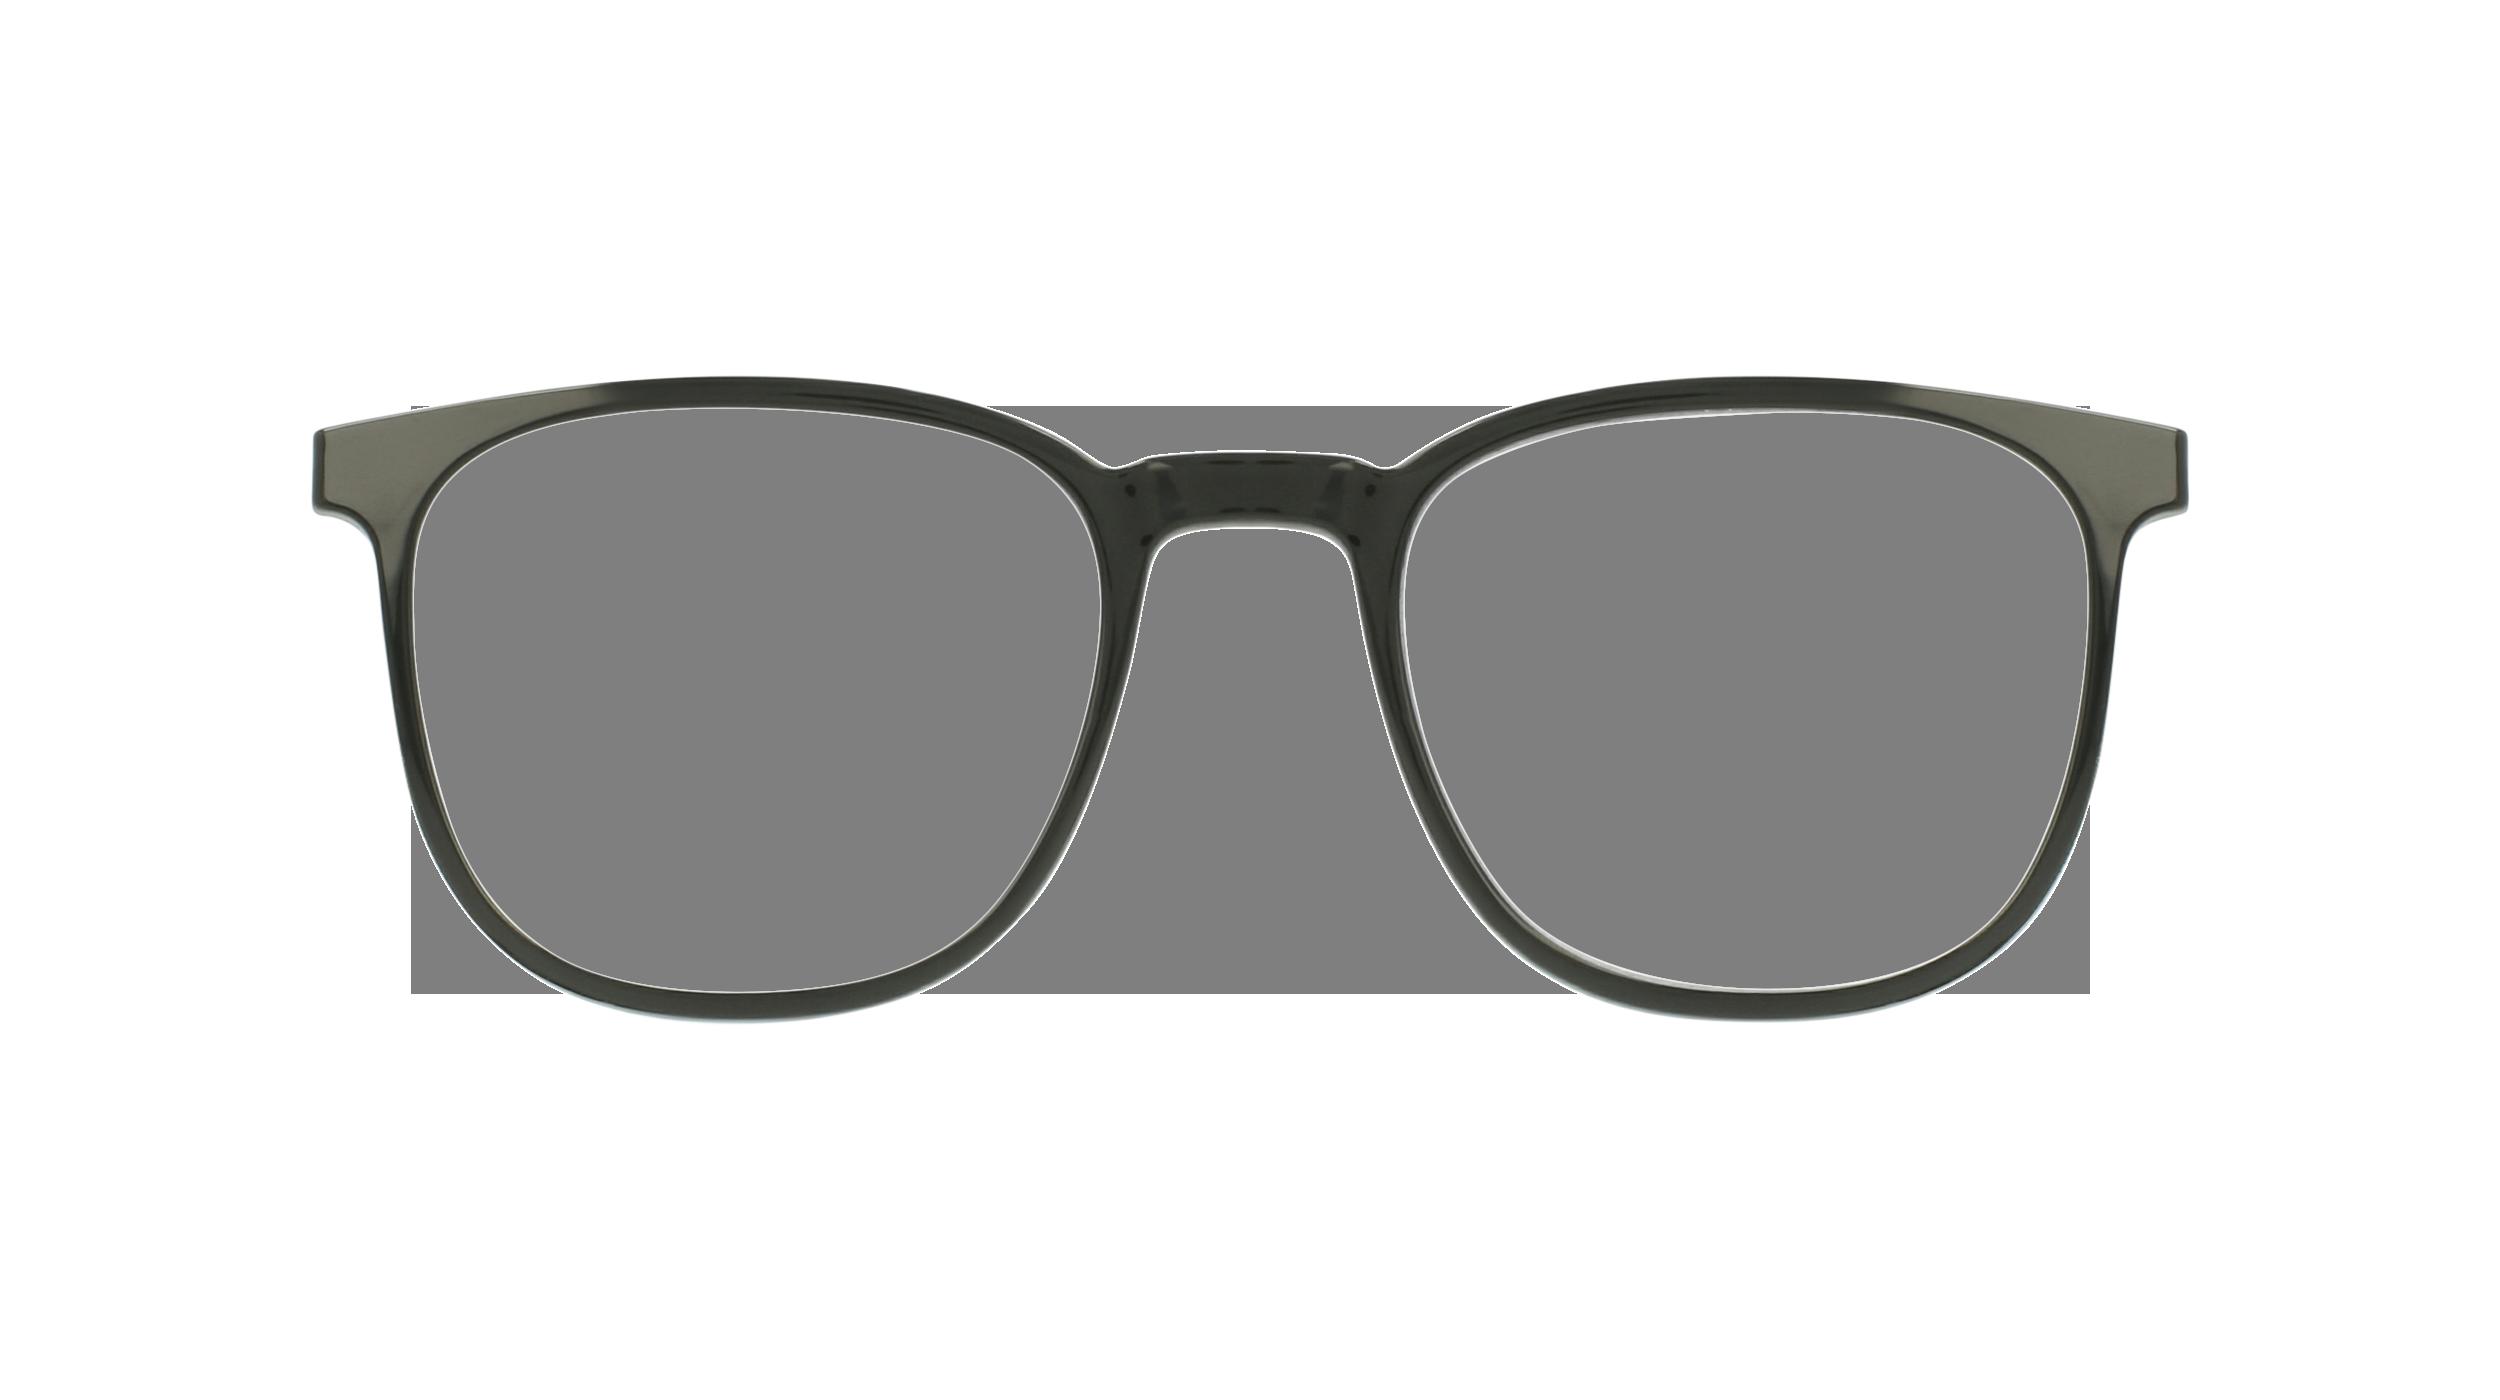 afflelou/france/products/smart_clip/clips_glasses/07630036457405.png